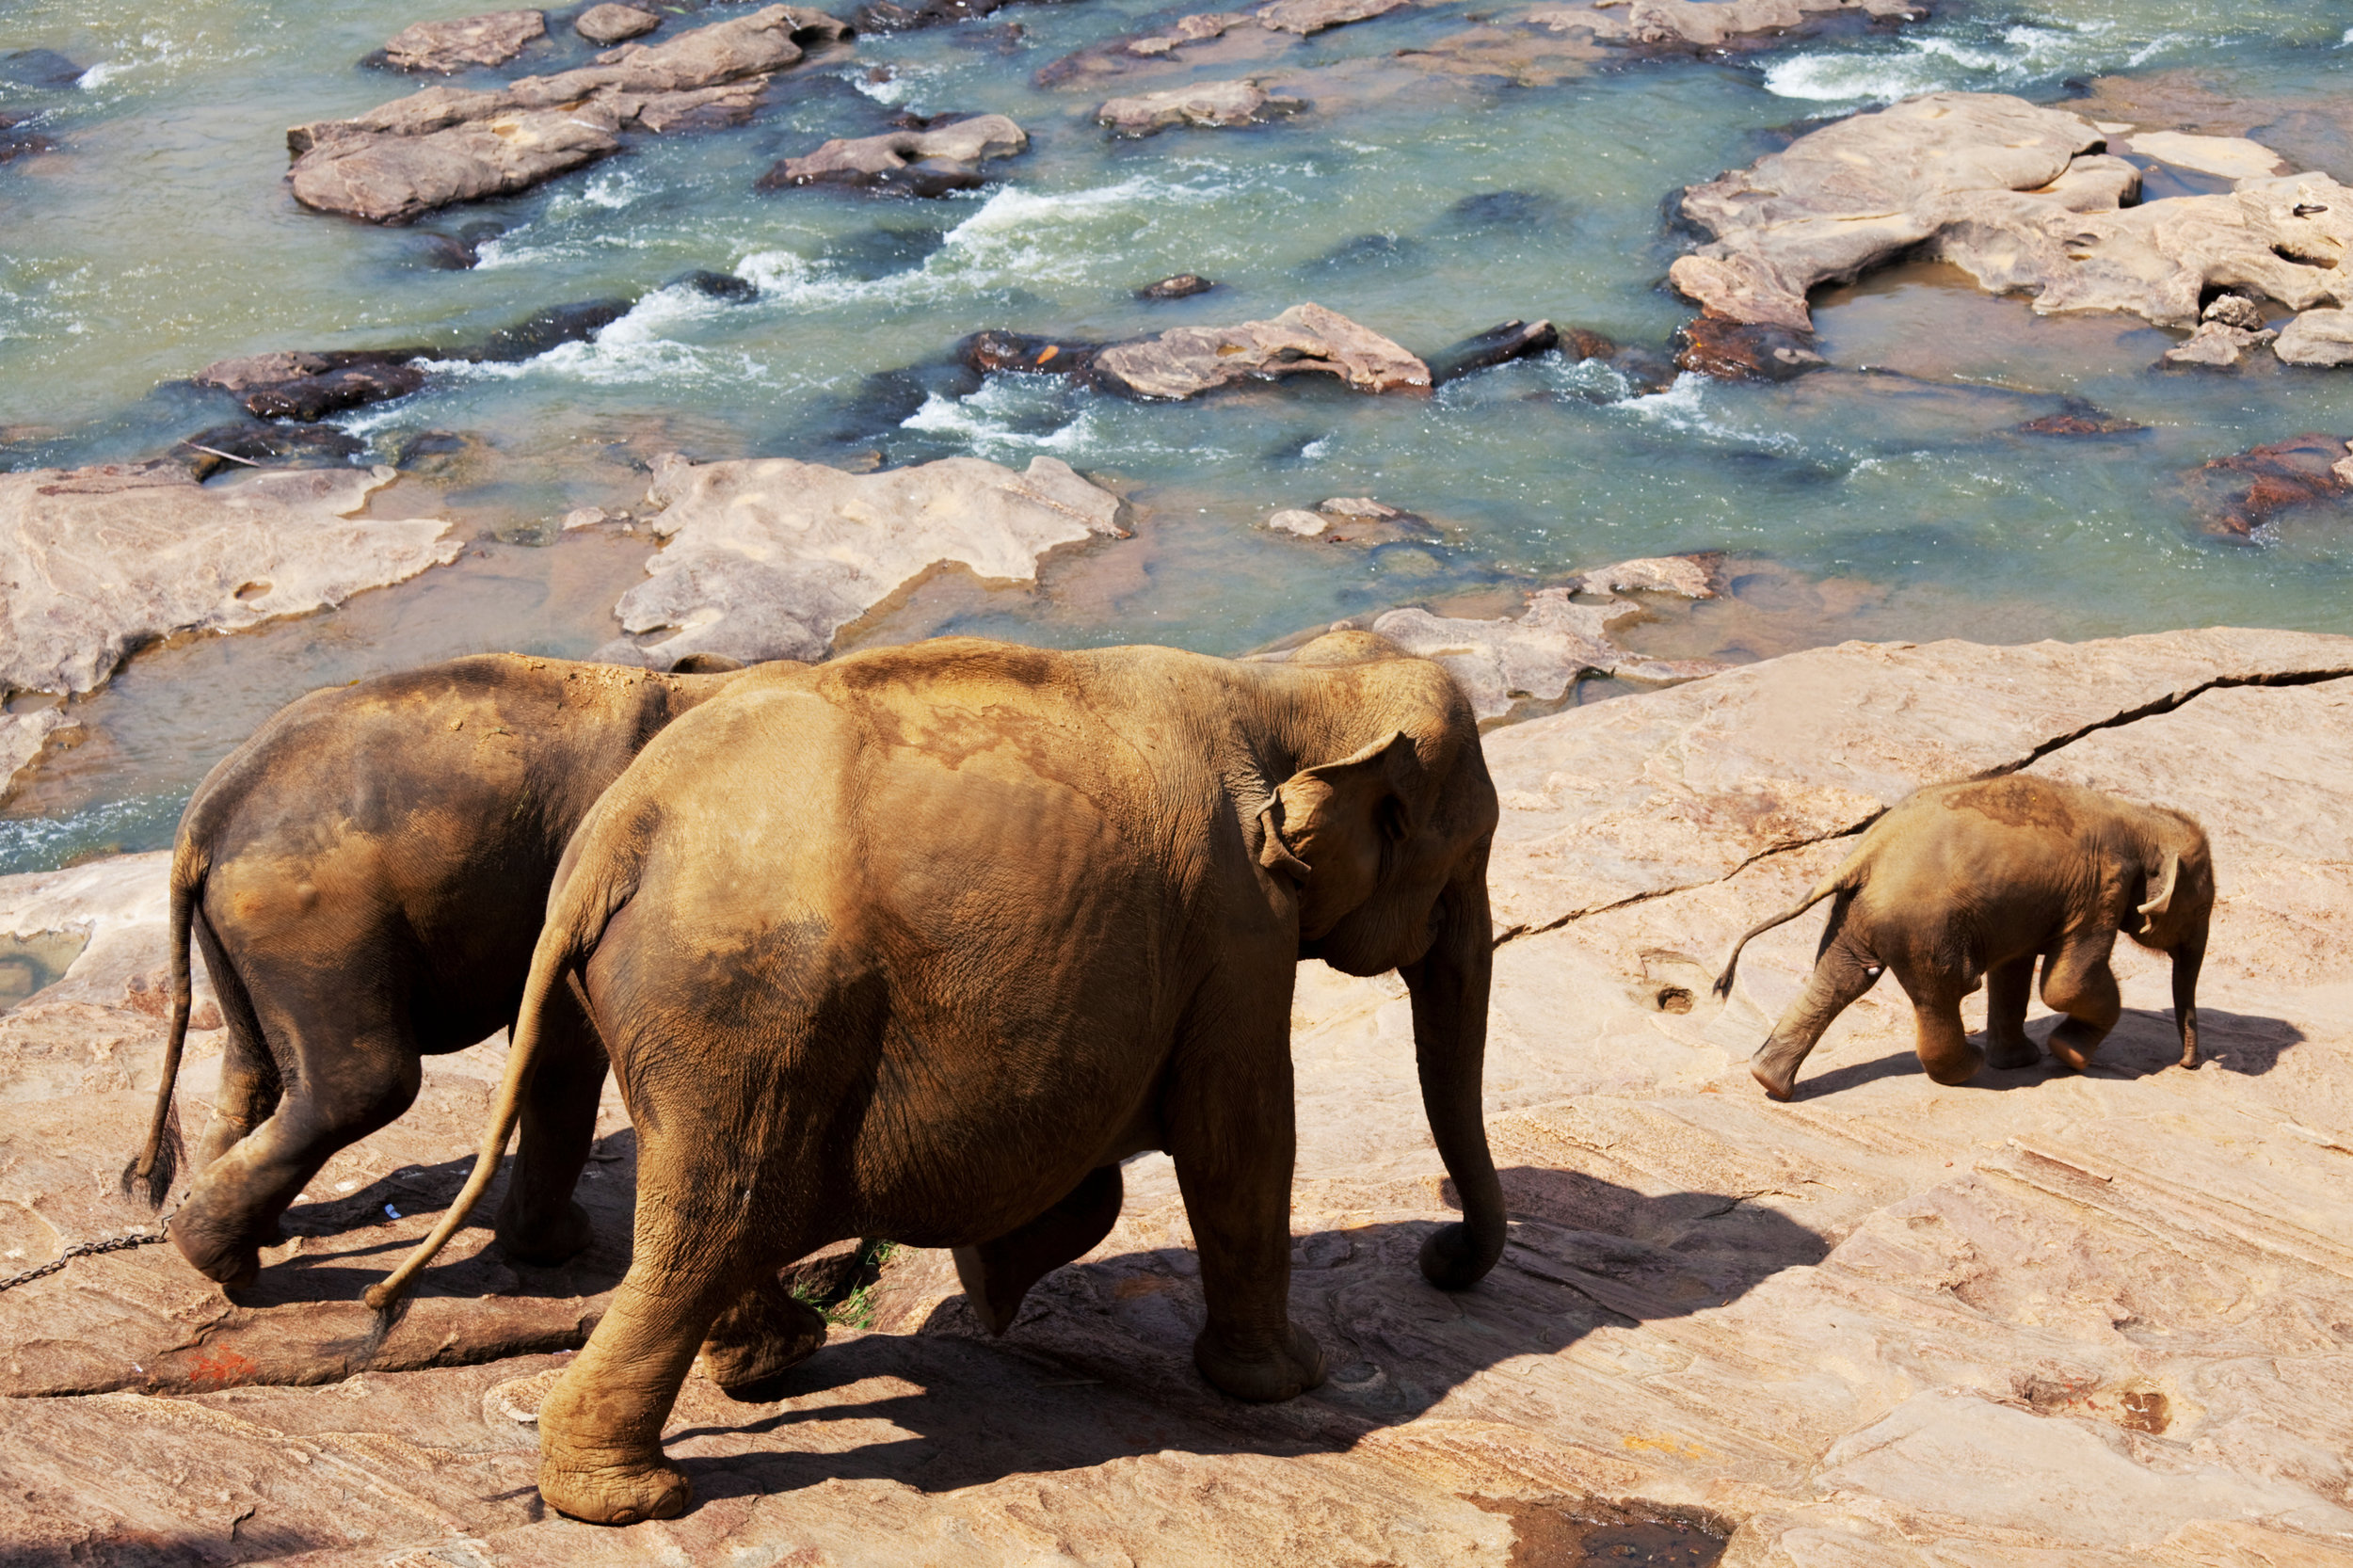 pinnawala-elephant-orphanage-sri-lanka-invite-to-paradise-river.jpg